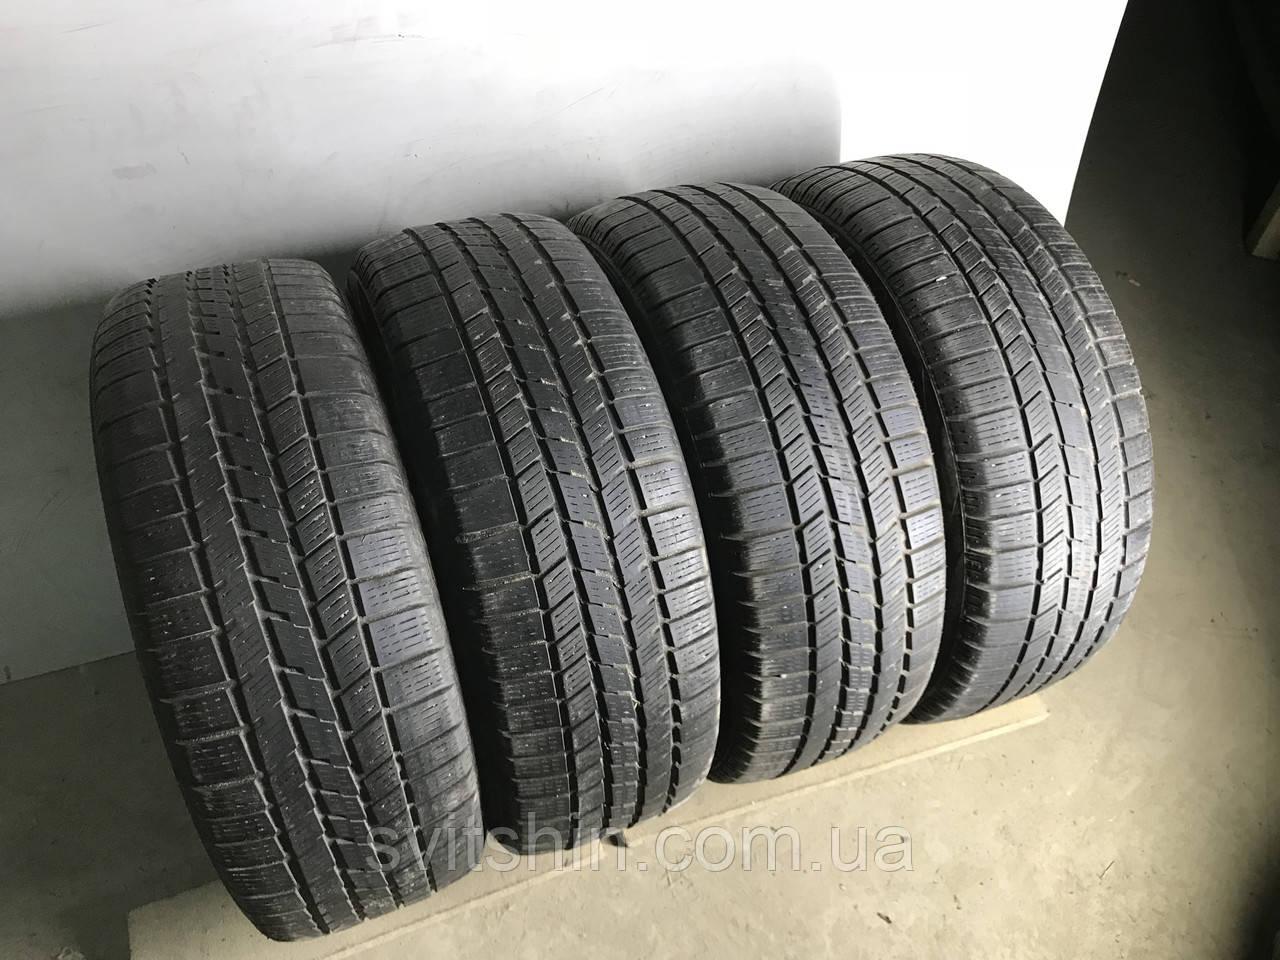 Шины бу зима 195/55R16 Pirelli Winter 210 Snowsport RFT 4шт (4,5-5,5мм)